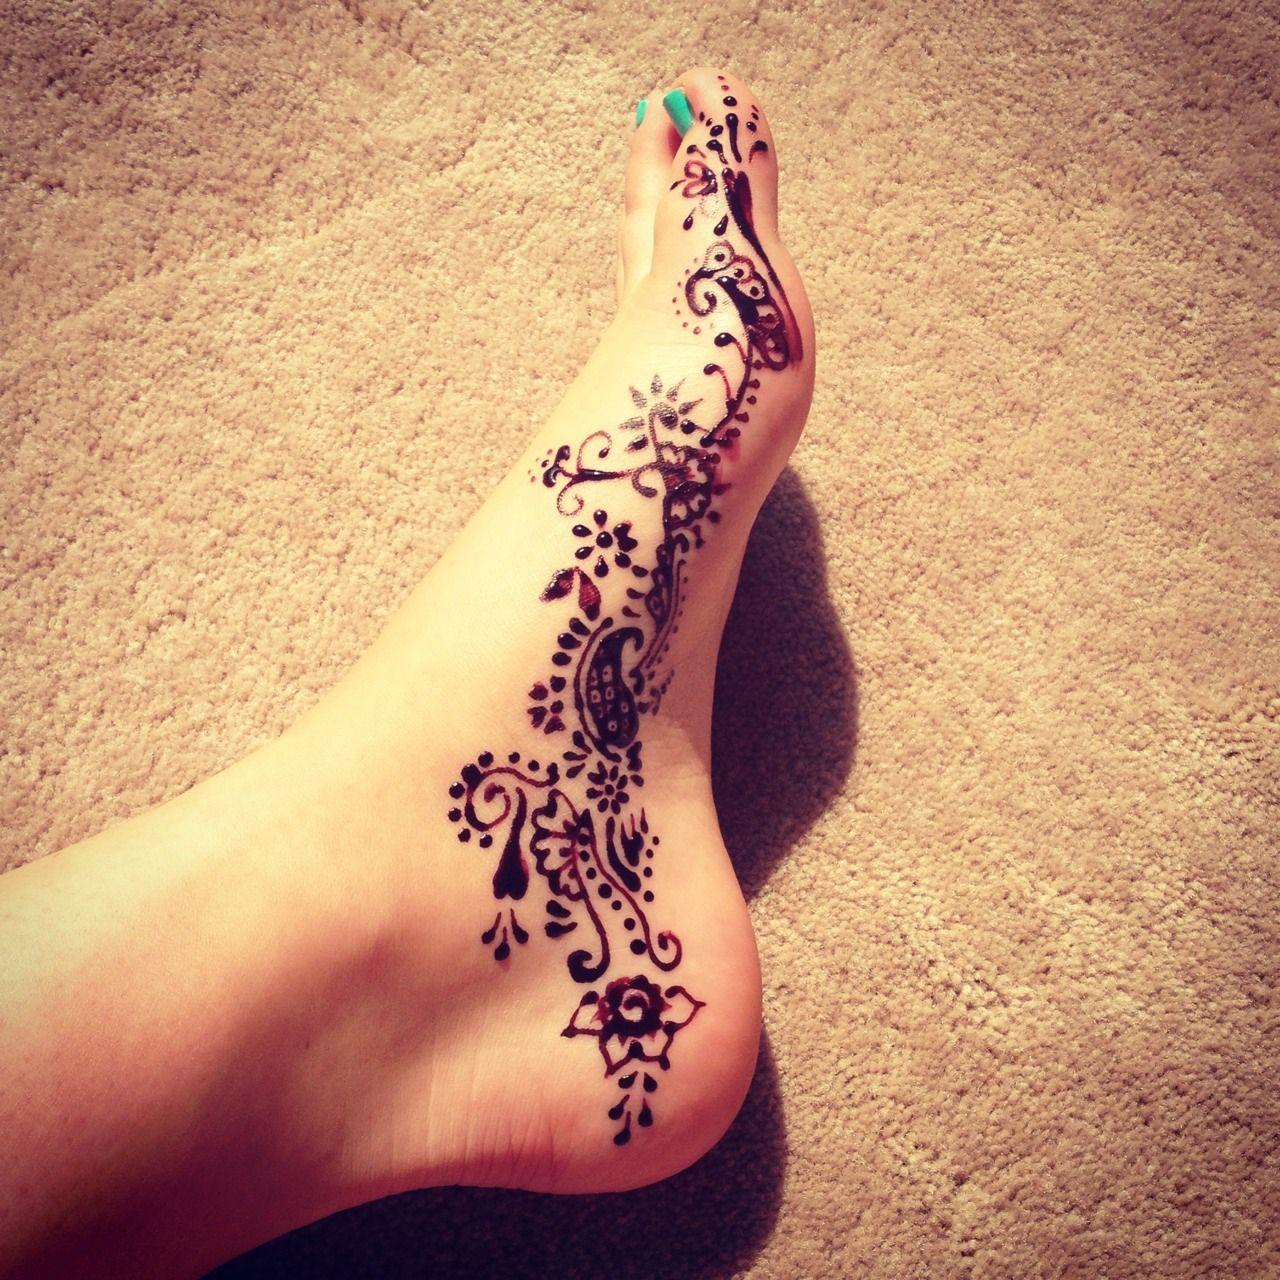 Pin By Dj On Henna Foot Henna Henna Tattoo Designs Henna Designs Feet